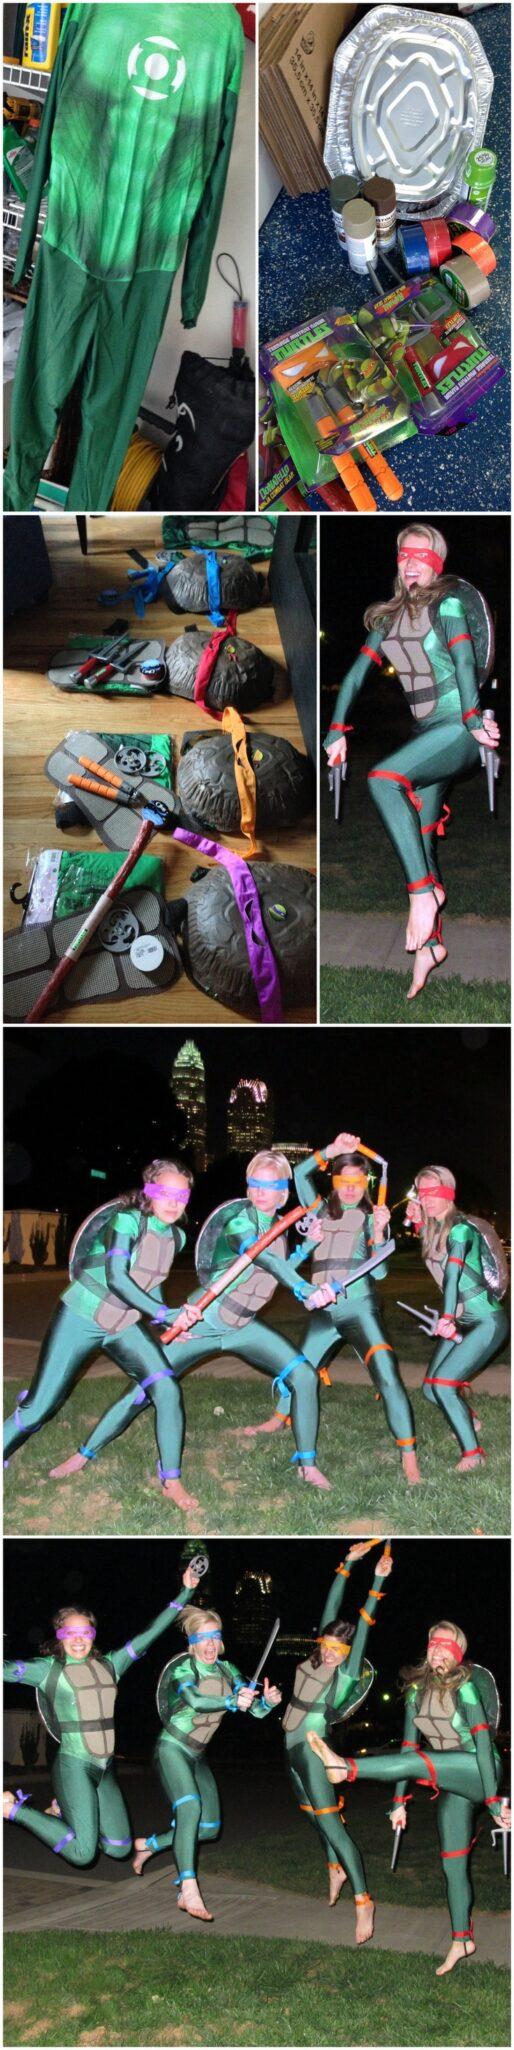 59 homemade diy teenage mutant ninja turtle costumes diy homemade tmnt costumes solutioingenieria Images